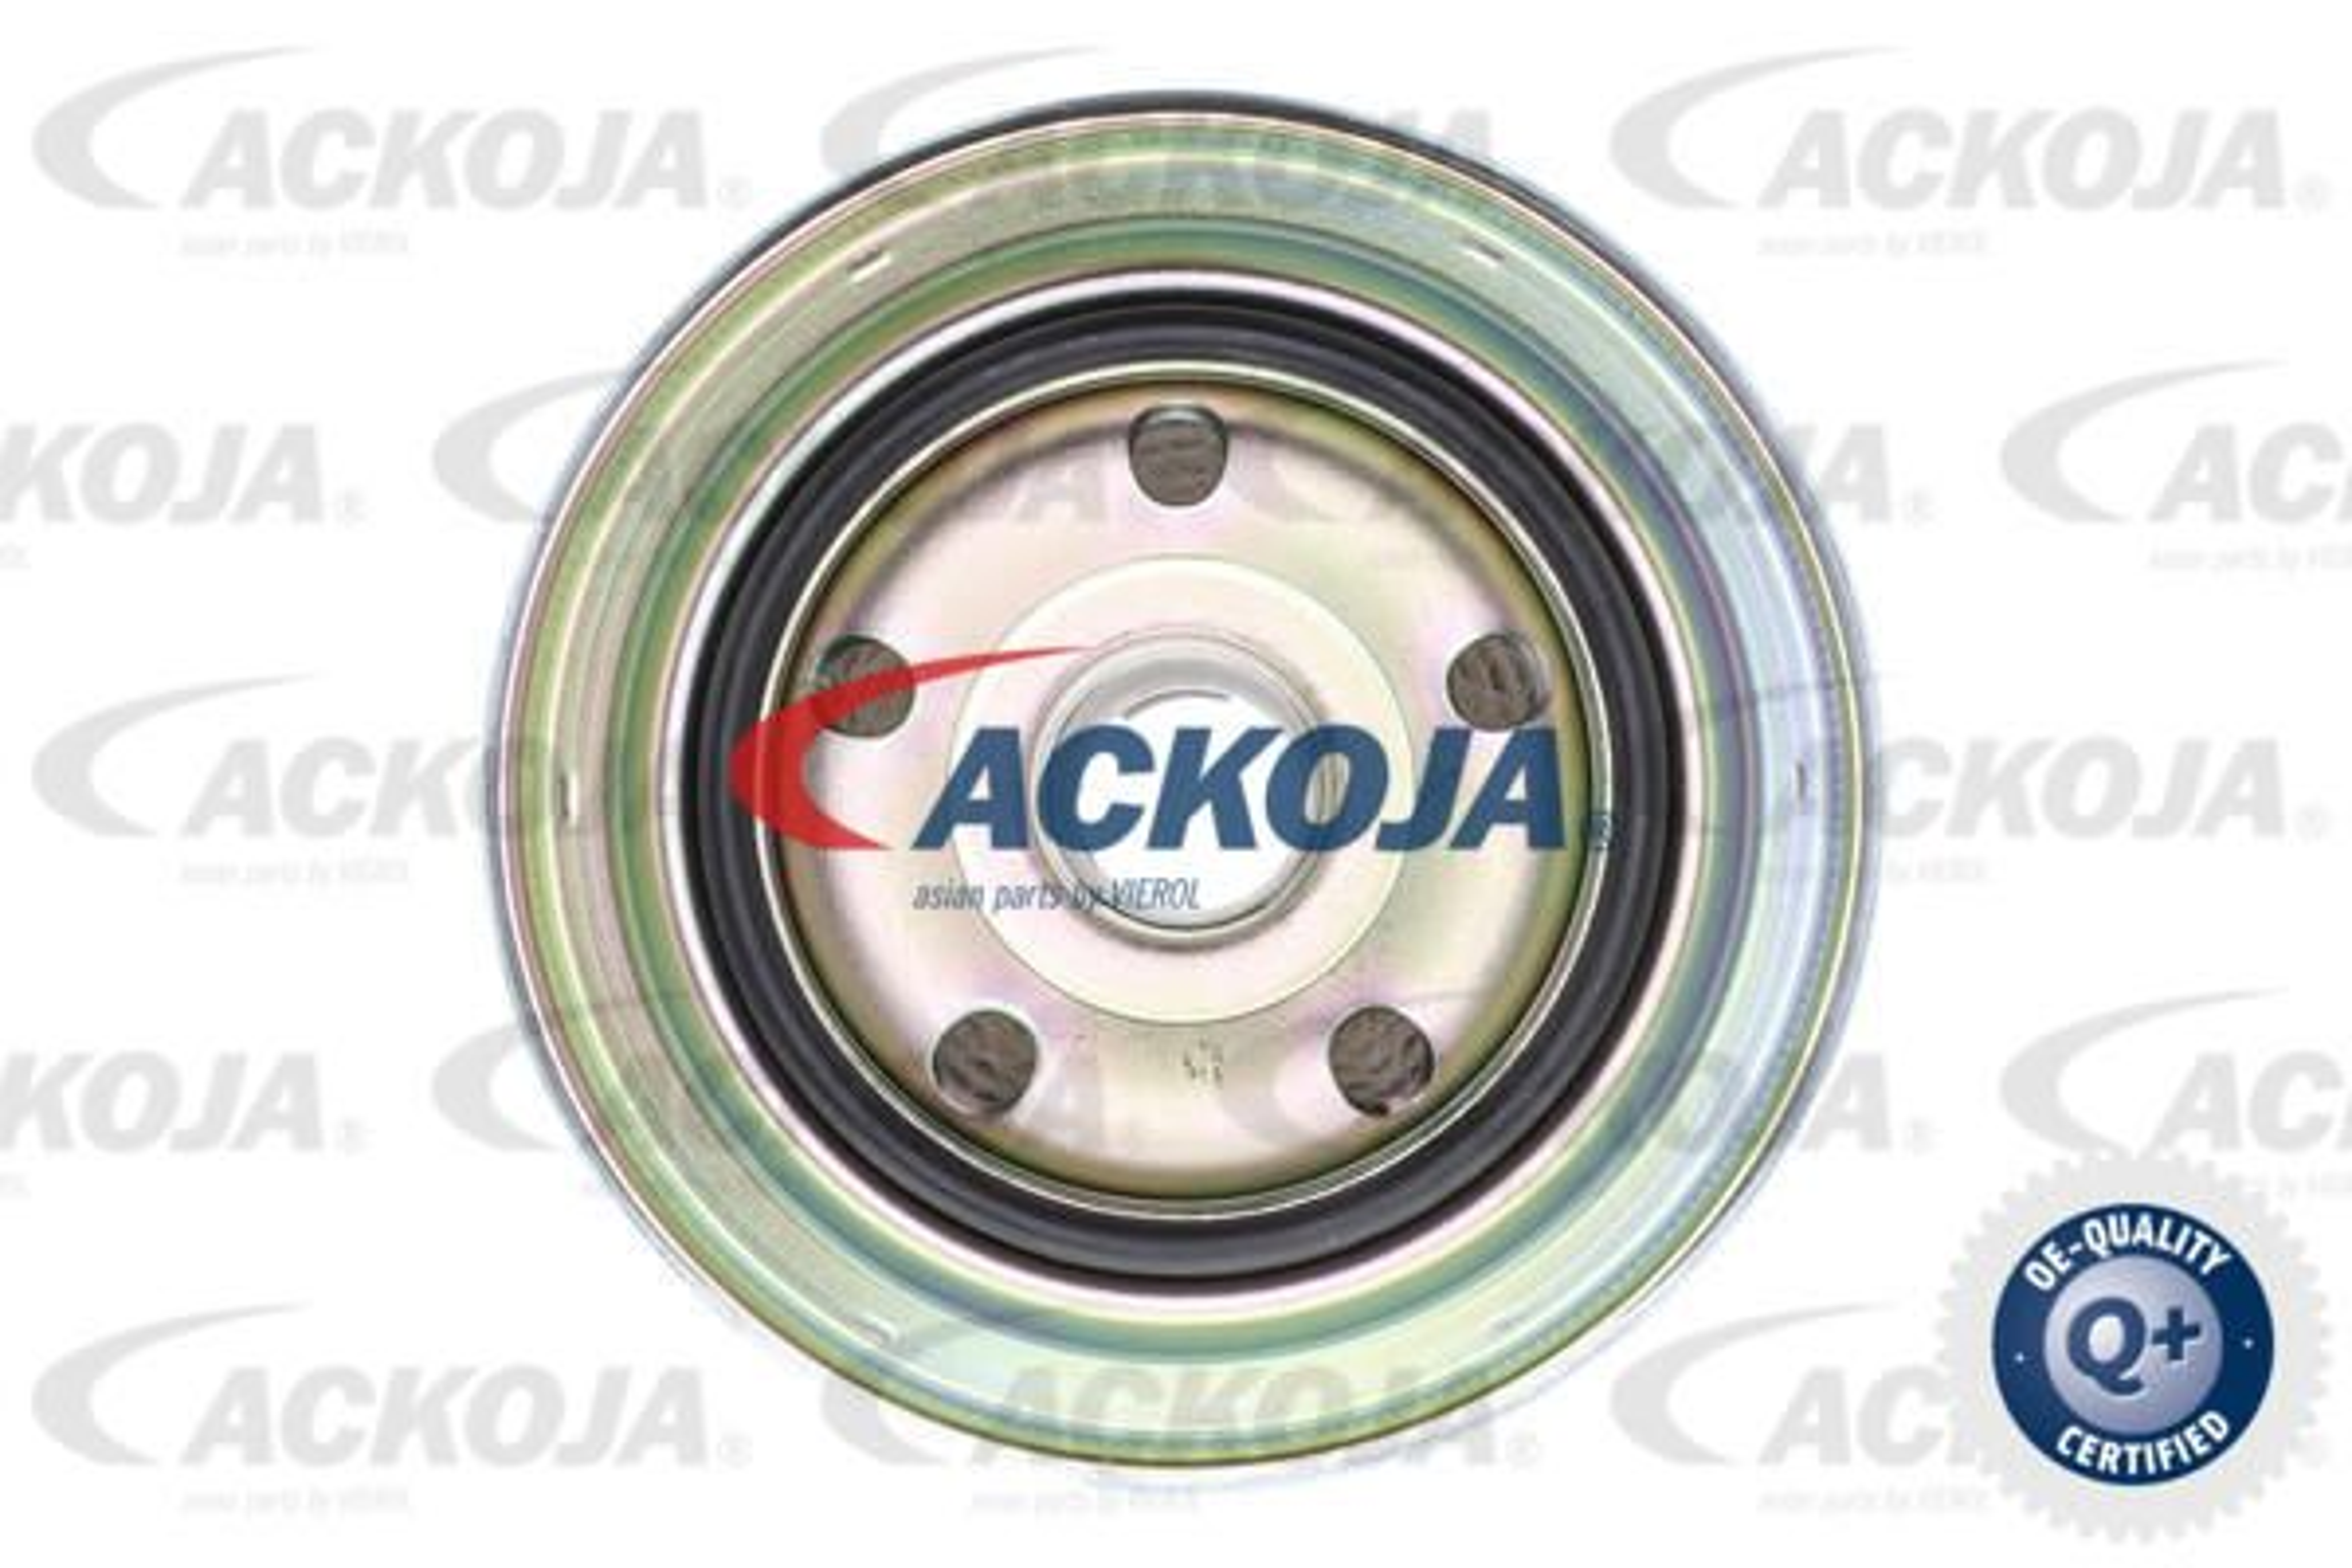 Inline fuel filter ACKOJA A70-0301 expert knowledge